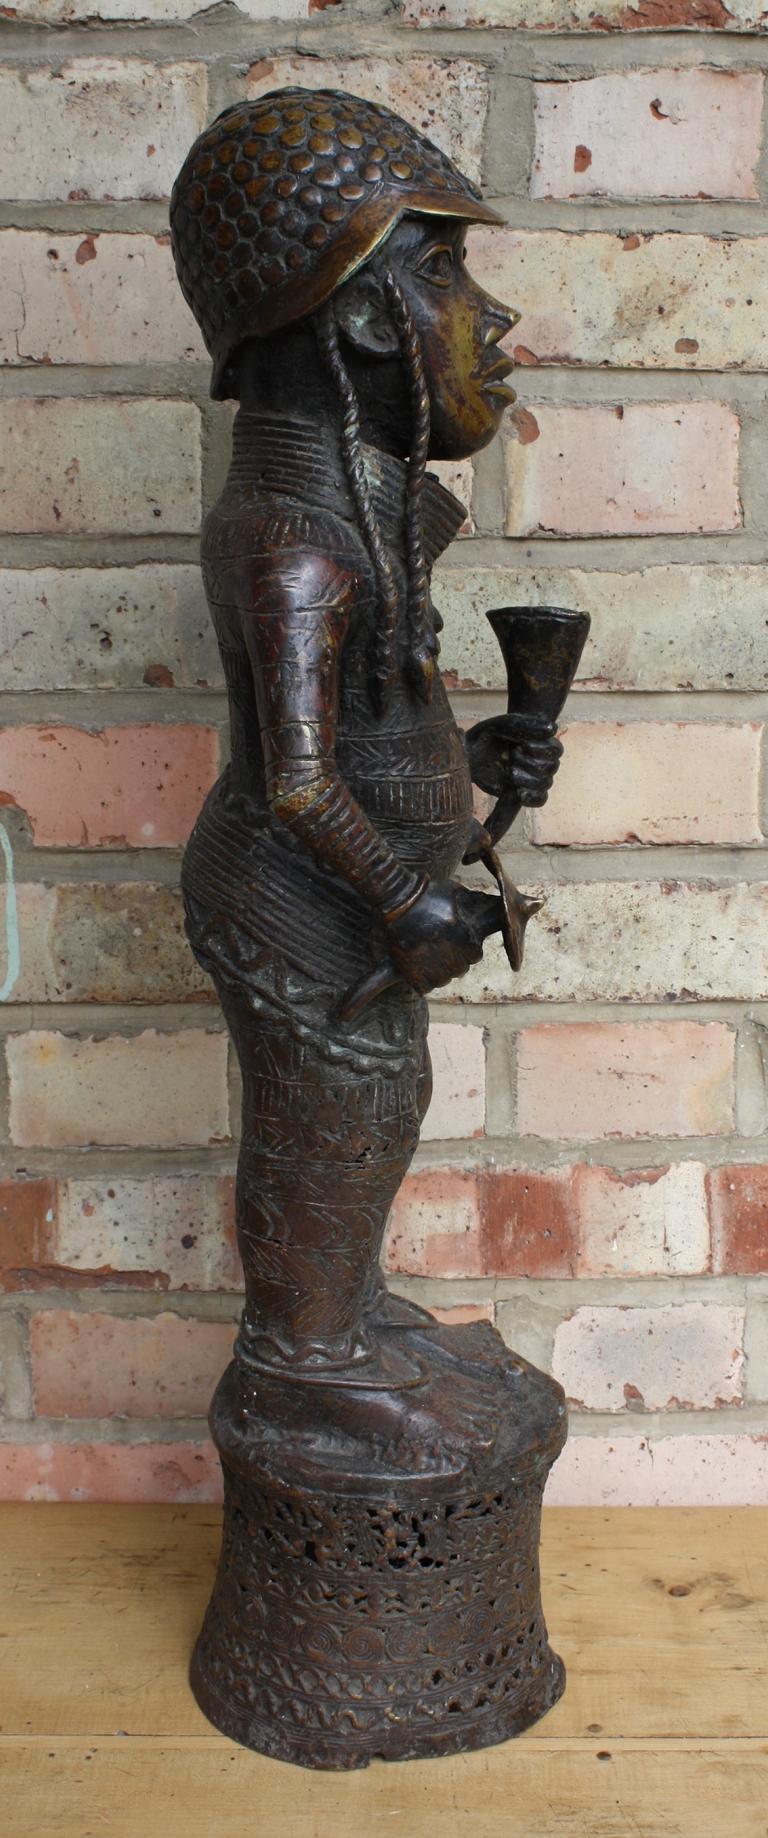 Würdenträger Bronzefigur, Benin, 1. Hälfte 20. Jh.-2